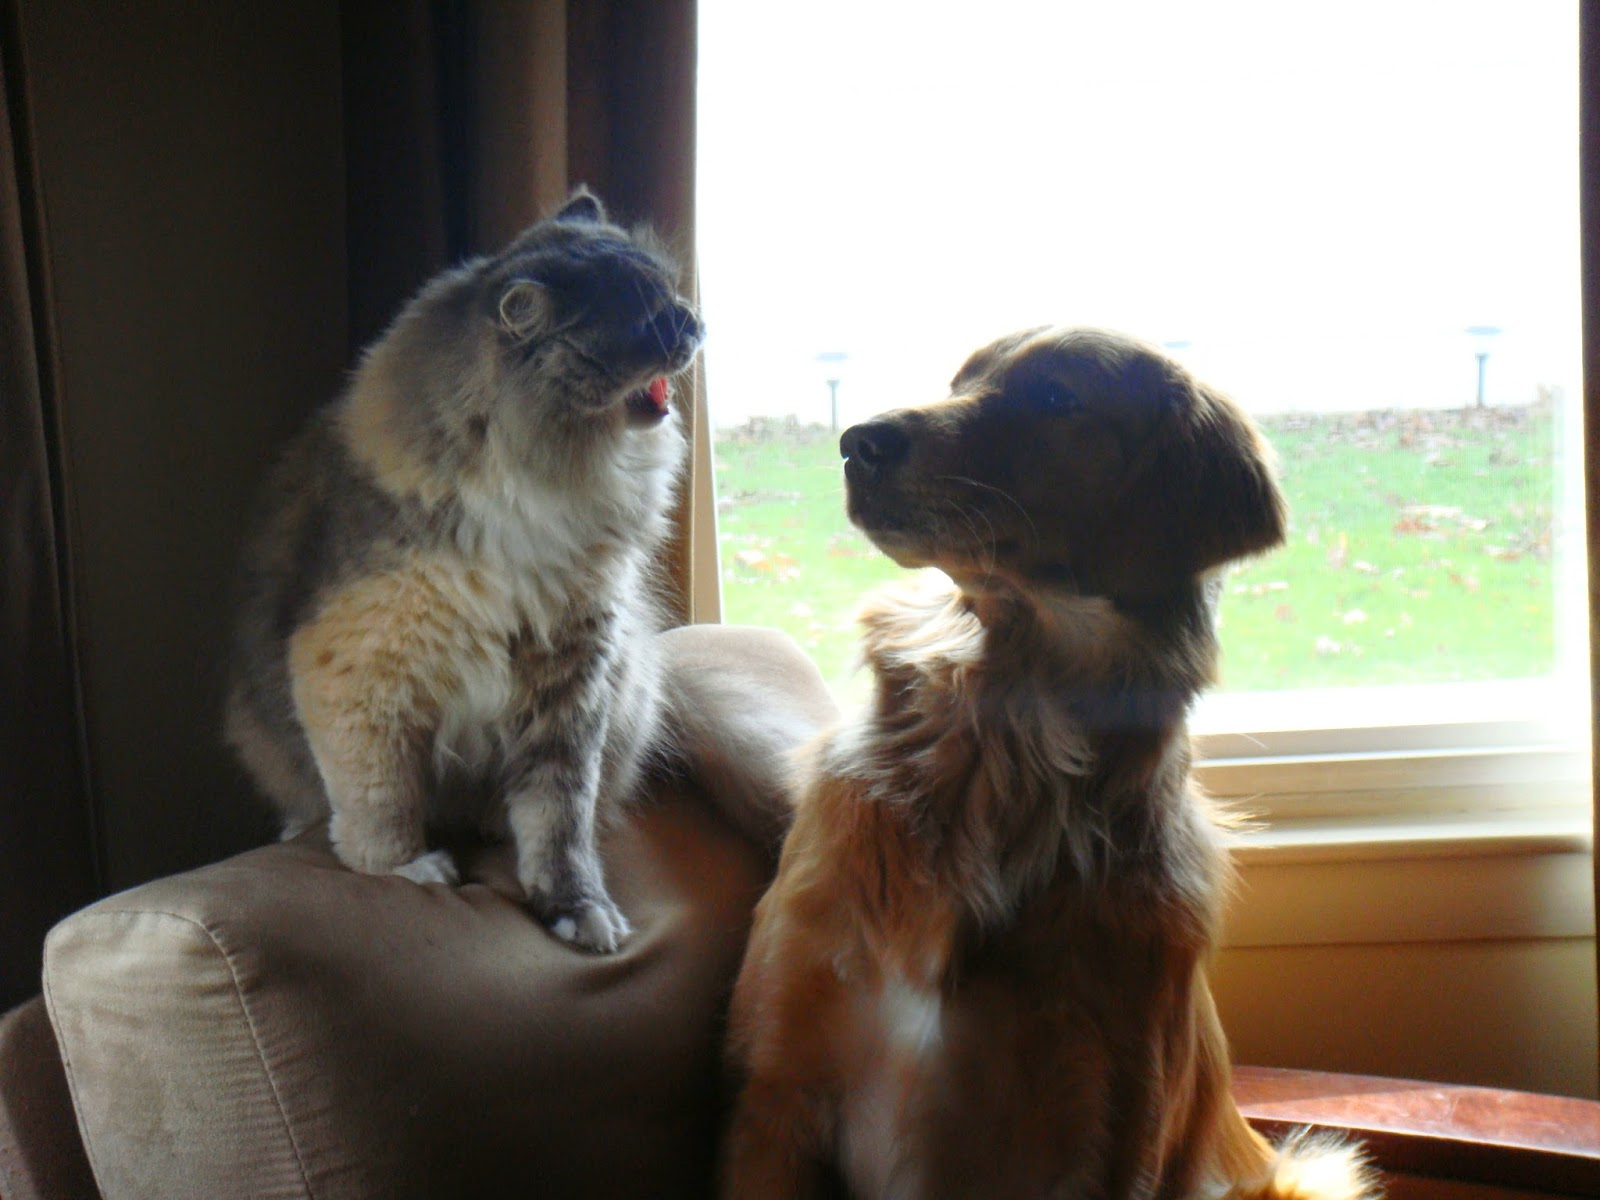 cat yelling at golden retriever dog